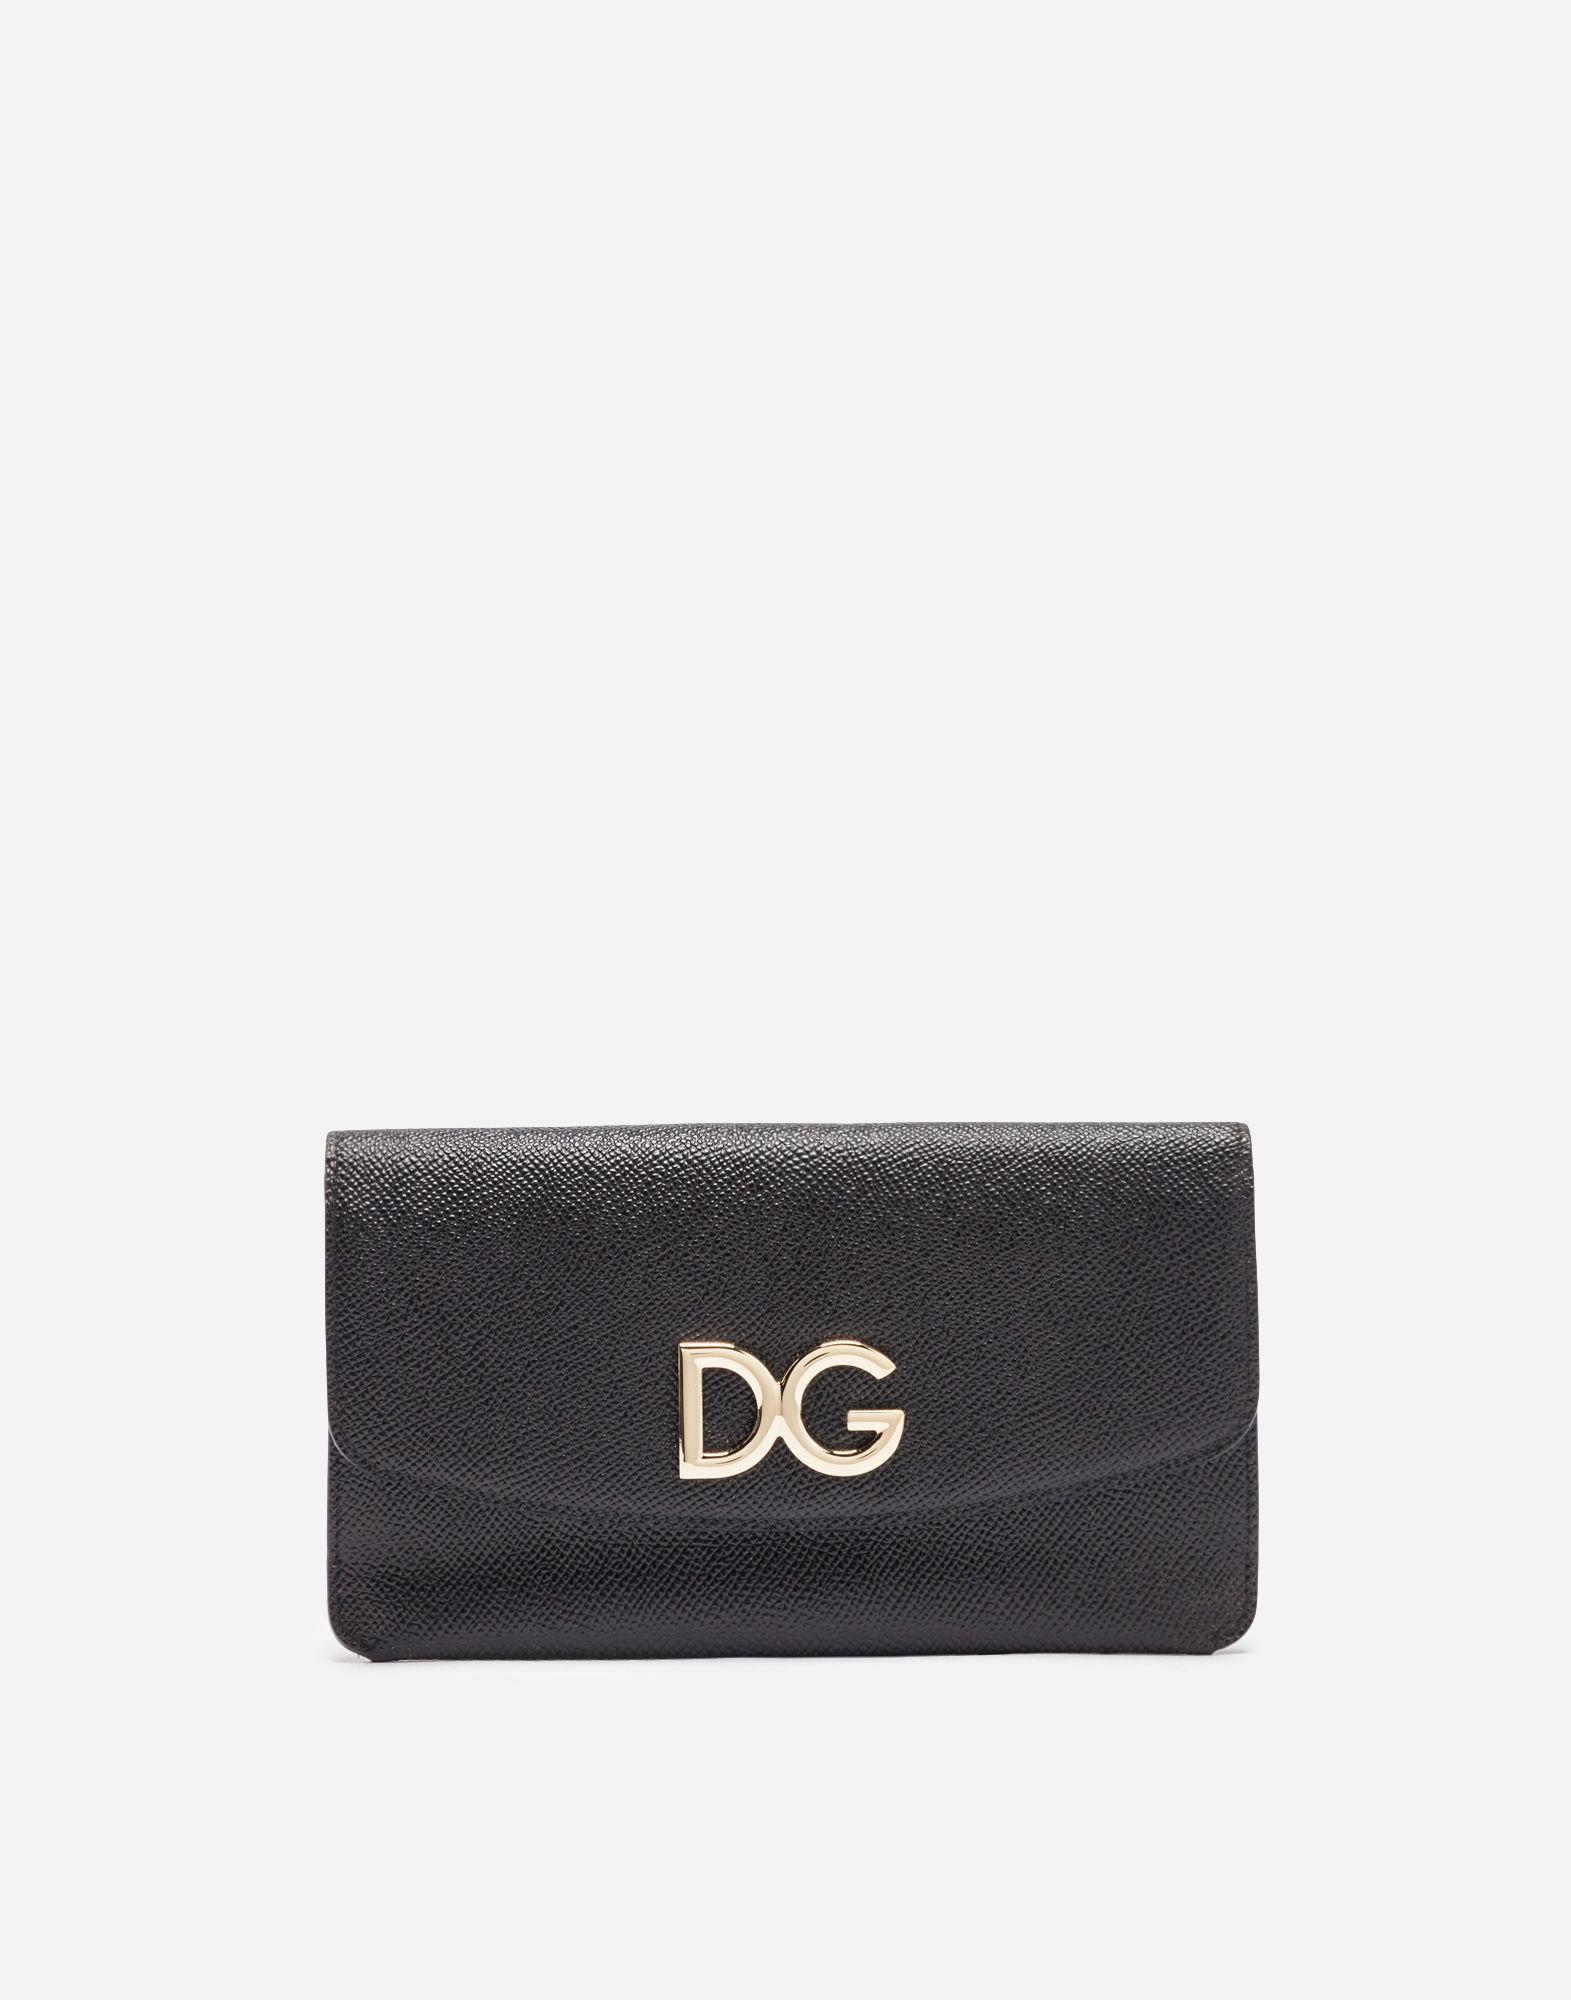 a677b2debe Lyst - Dolce & Gabbana Leather Multi-functional Wallet in Black